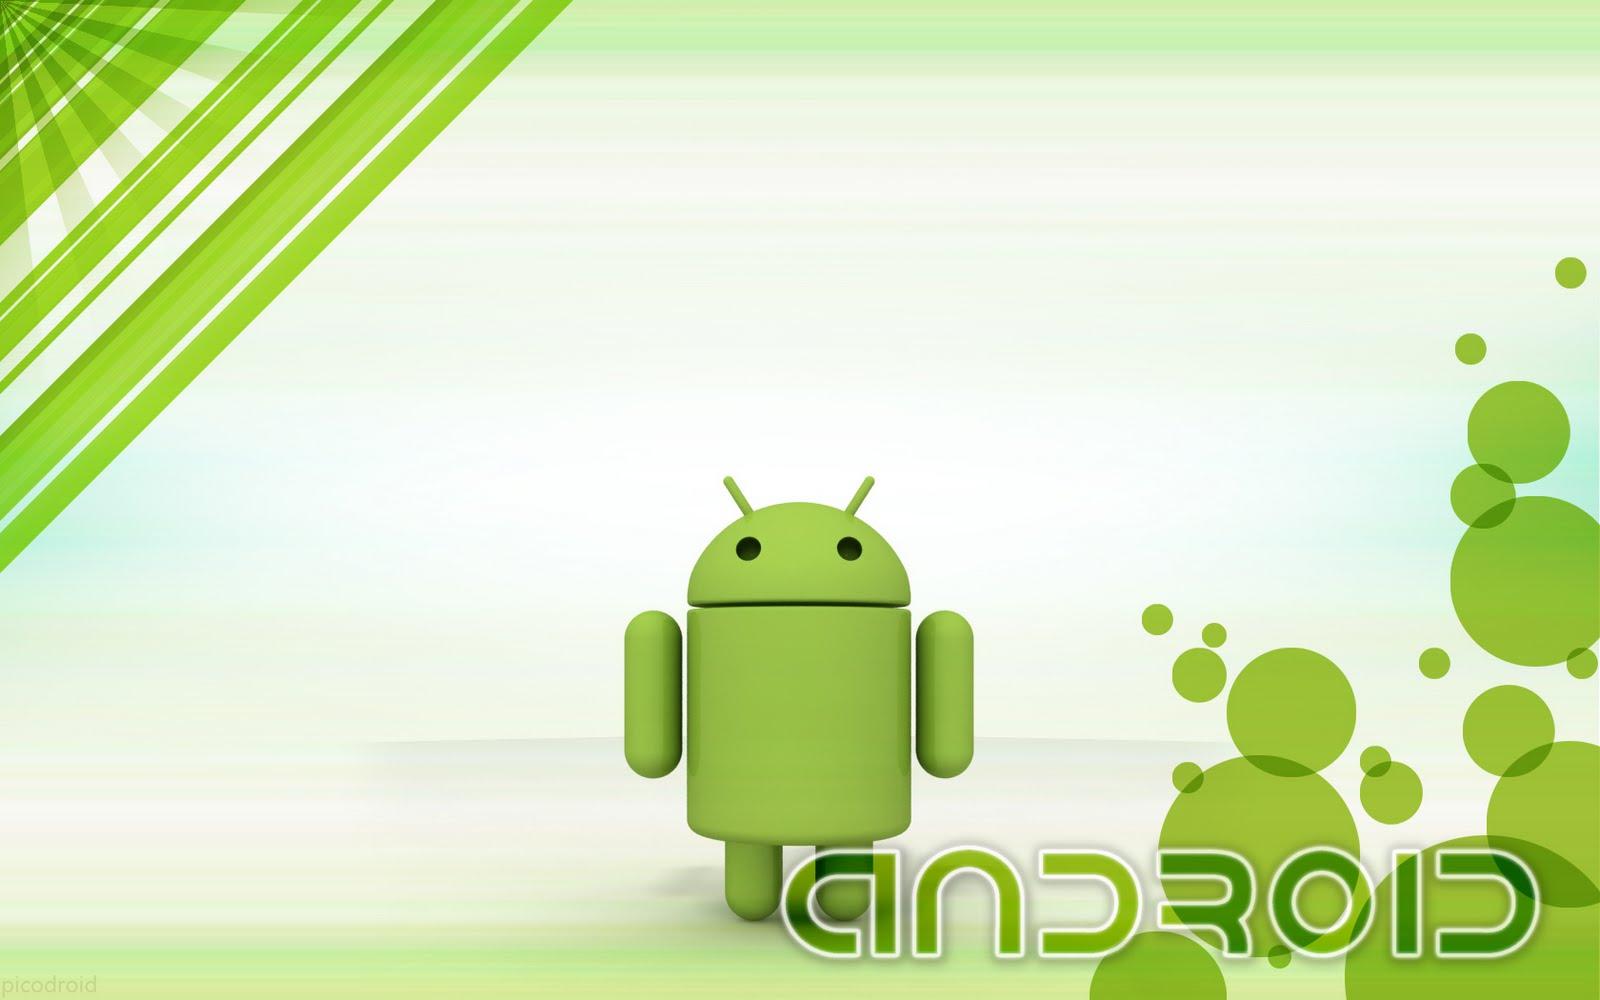 http://4.bp.blogspot.com/-bNSJ0BU_gQA/TltViZFnqxI/AAAAAAAAAT8/TqrQU8qlKVk/s1600/wallpaper+android4.jpg